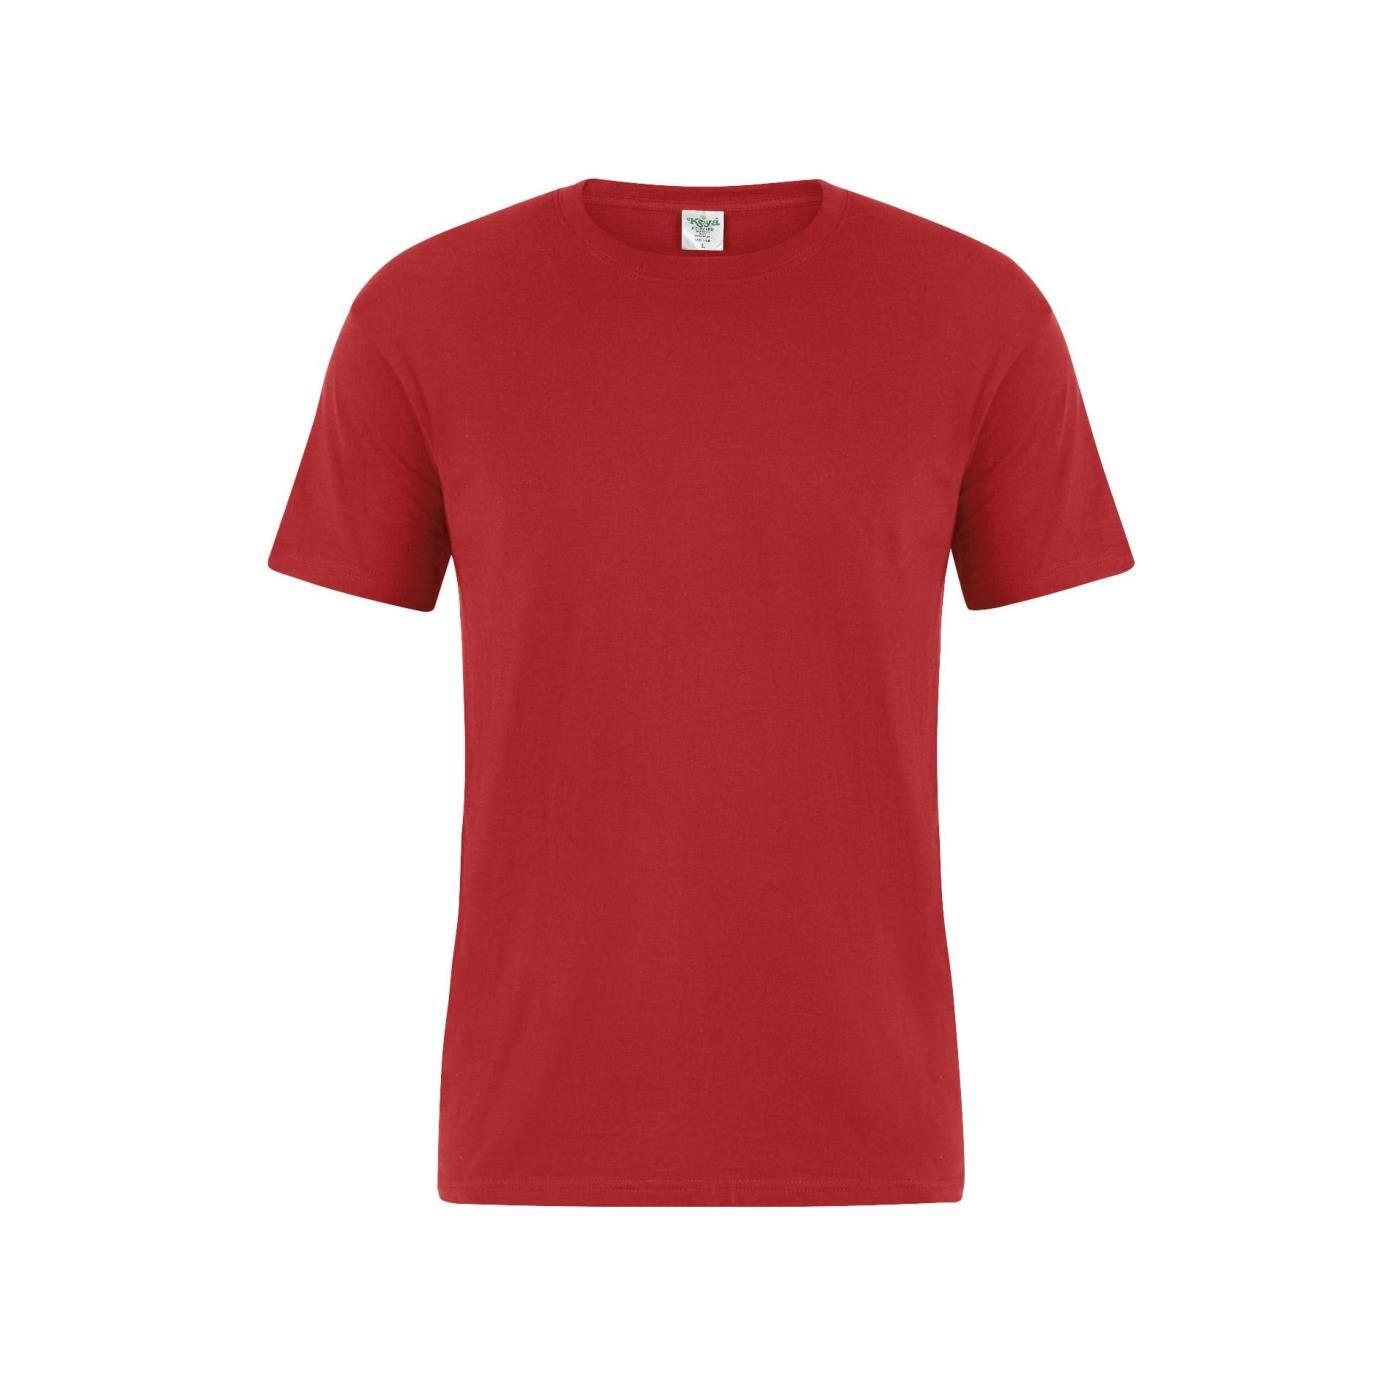 Celestino Βαμβακερό ανδρικό T-shirt  - Κοκκινο - Grootte: Medium